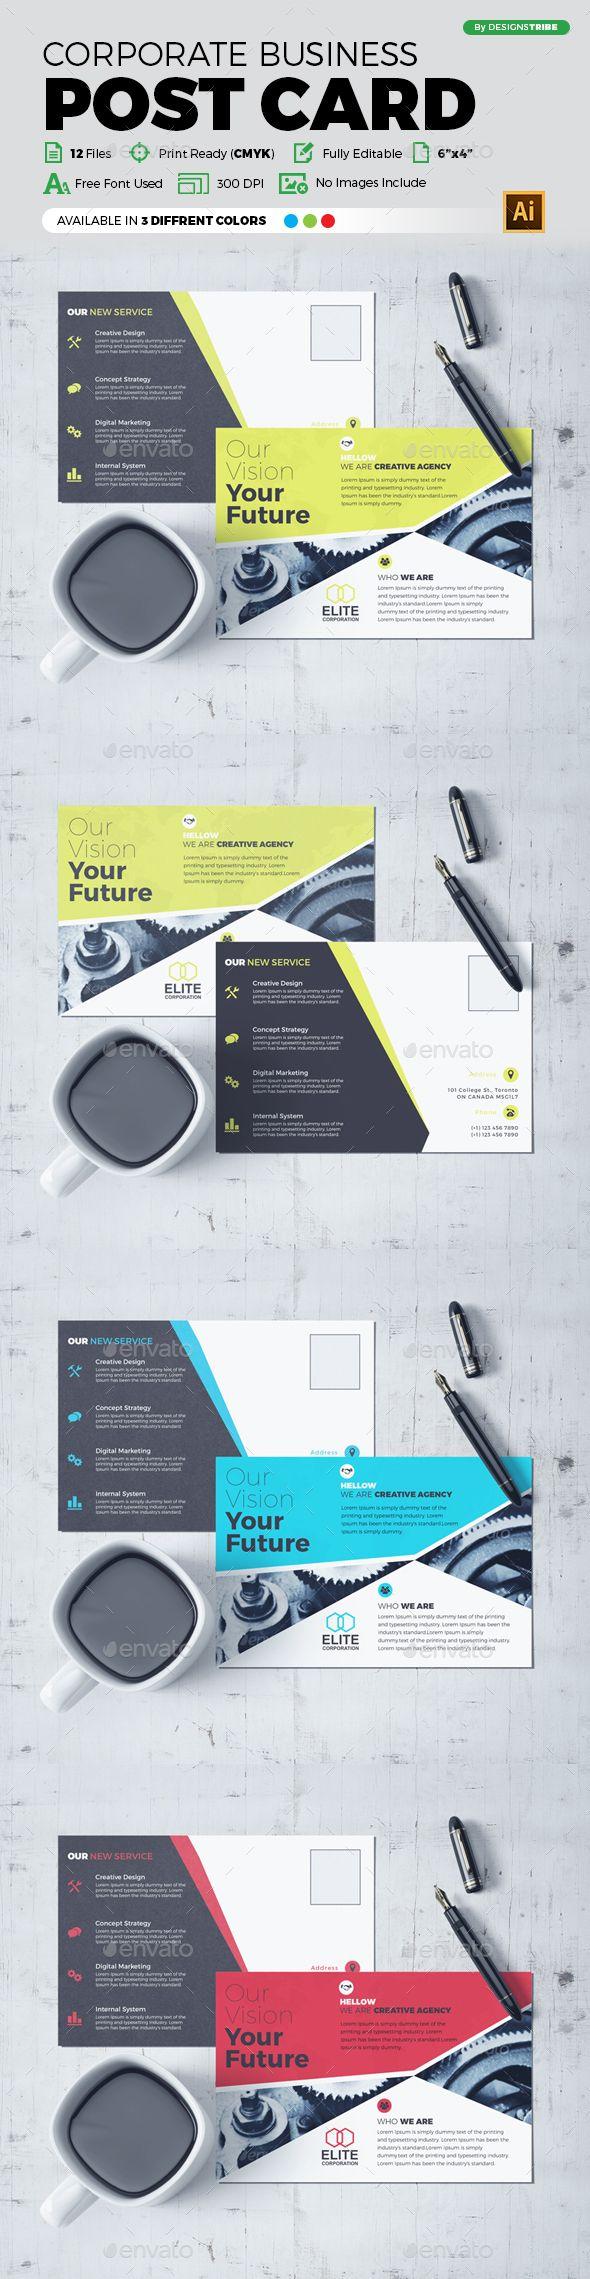 Post Card Design   Post card, Ai illustrator and Postcard design